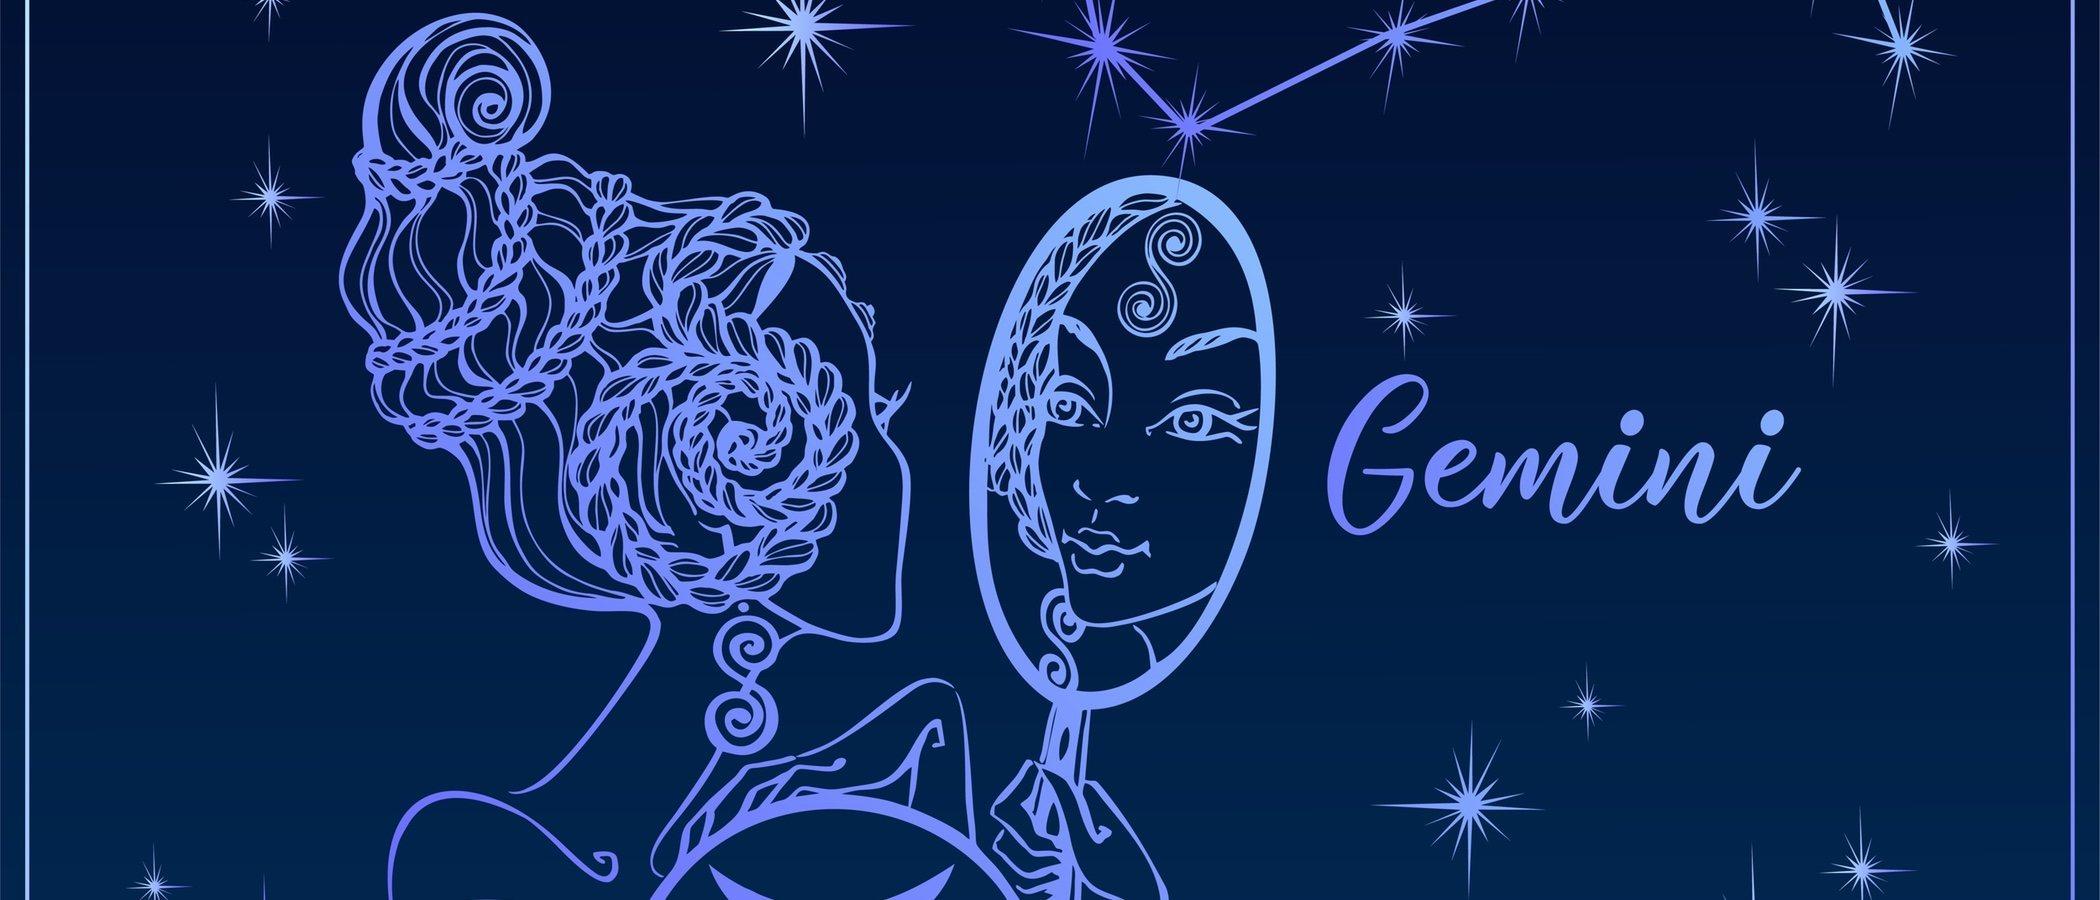 Horóscopo abril 2021: Géminis